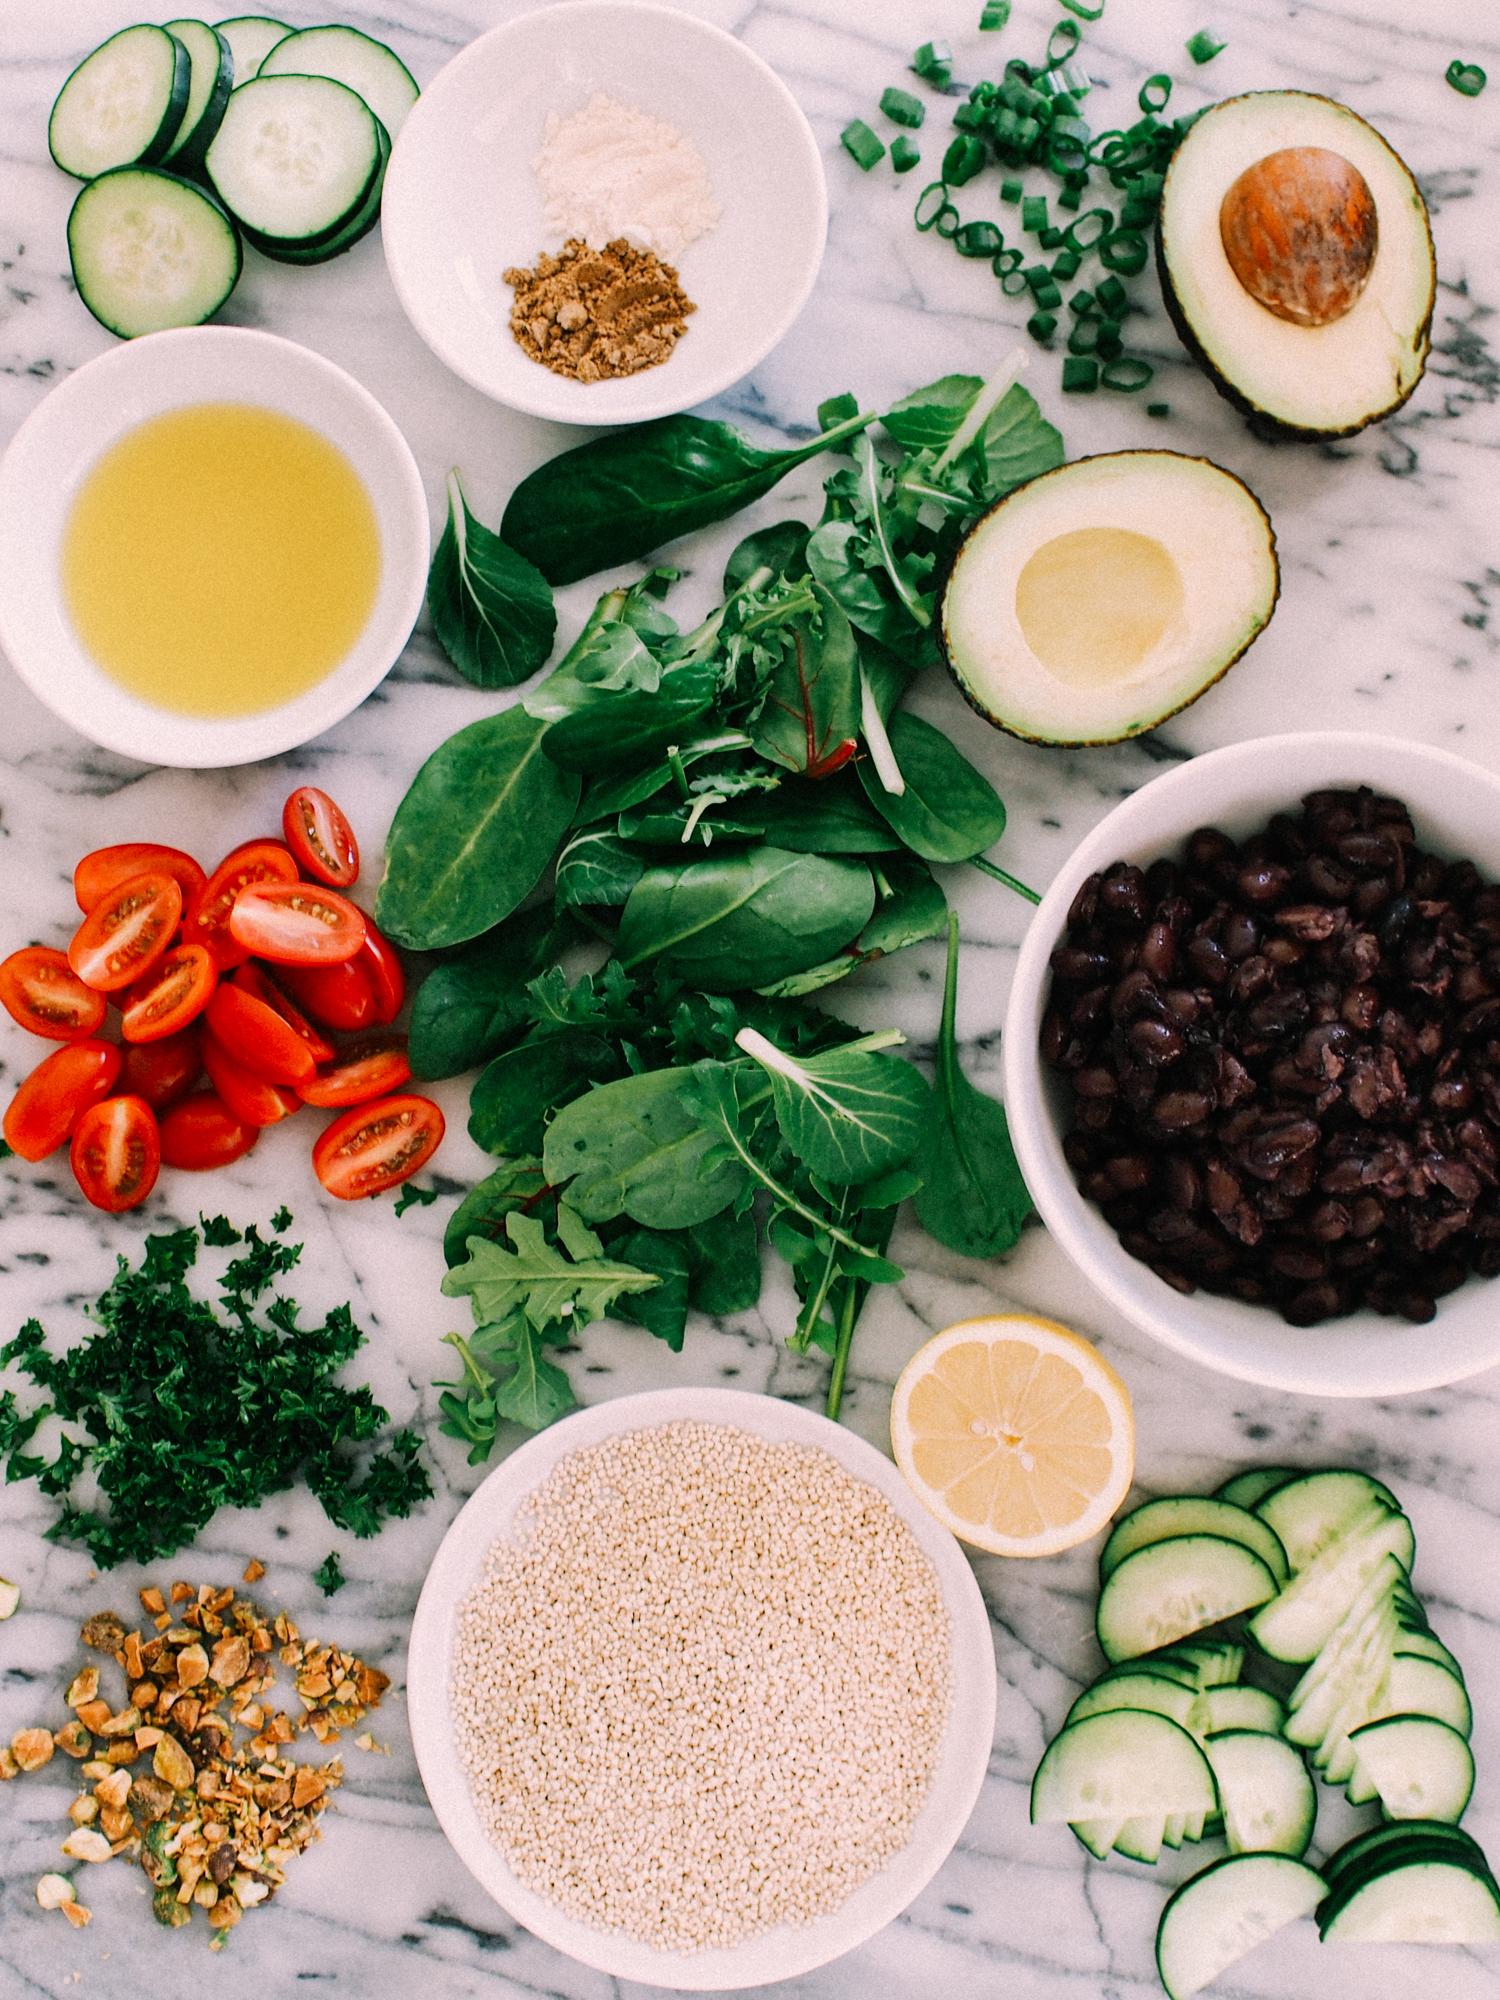 Simple weekday salad ingredients | A Fabulous Fete